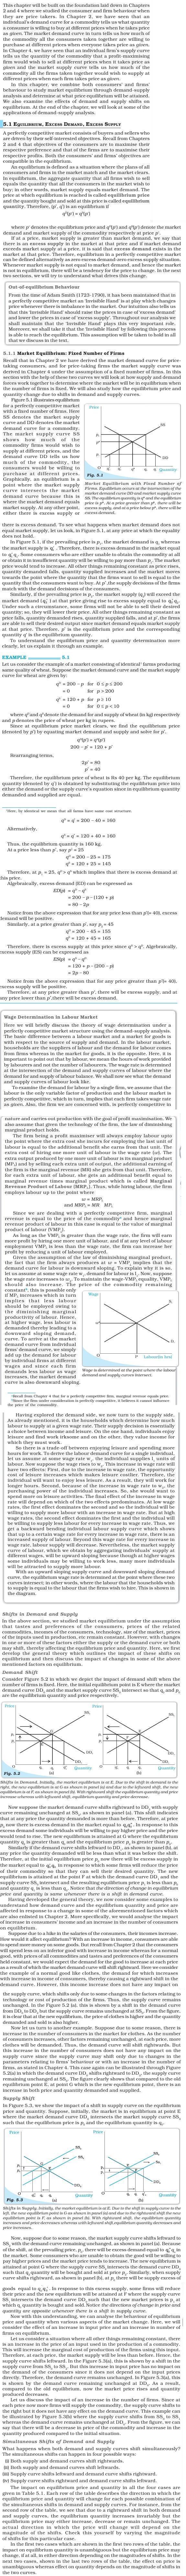 NCERT Class XII Economics Microeconomics - Market Equilibrium